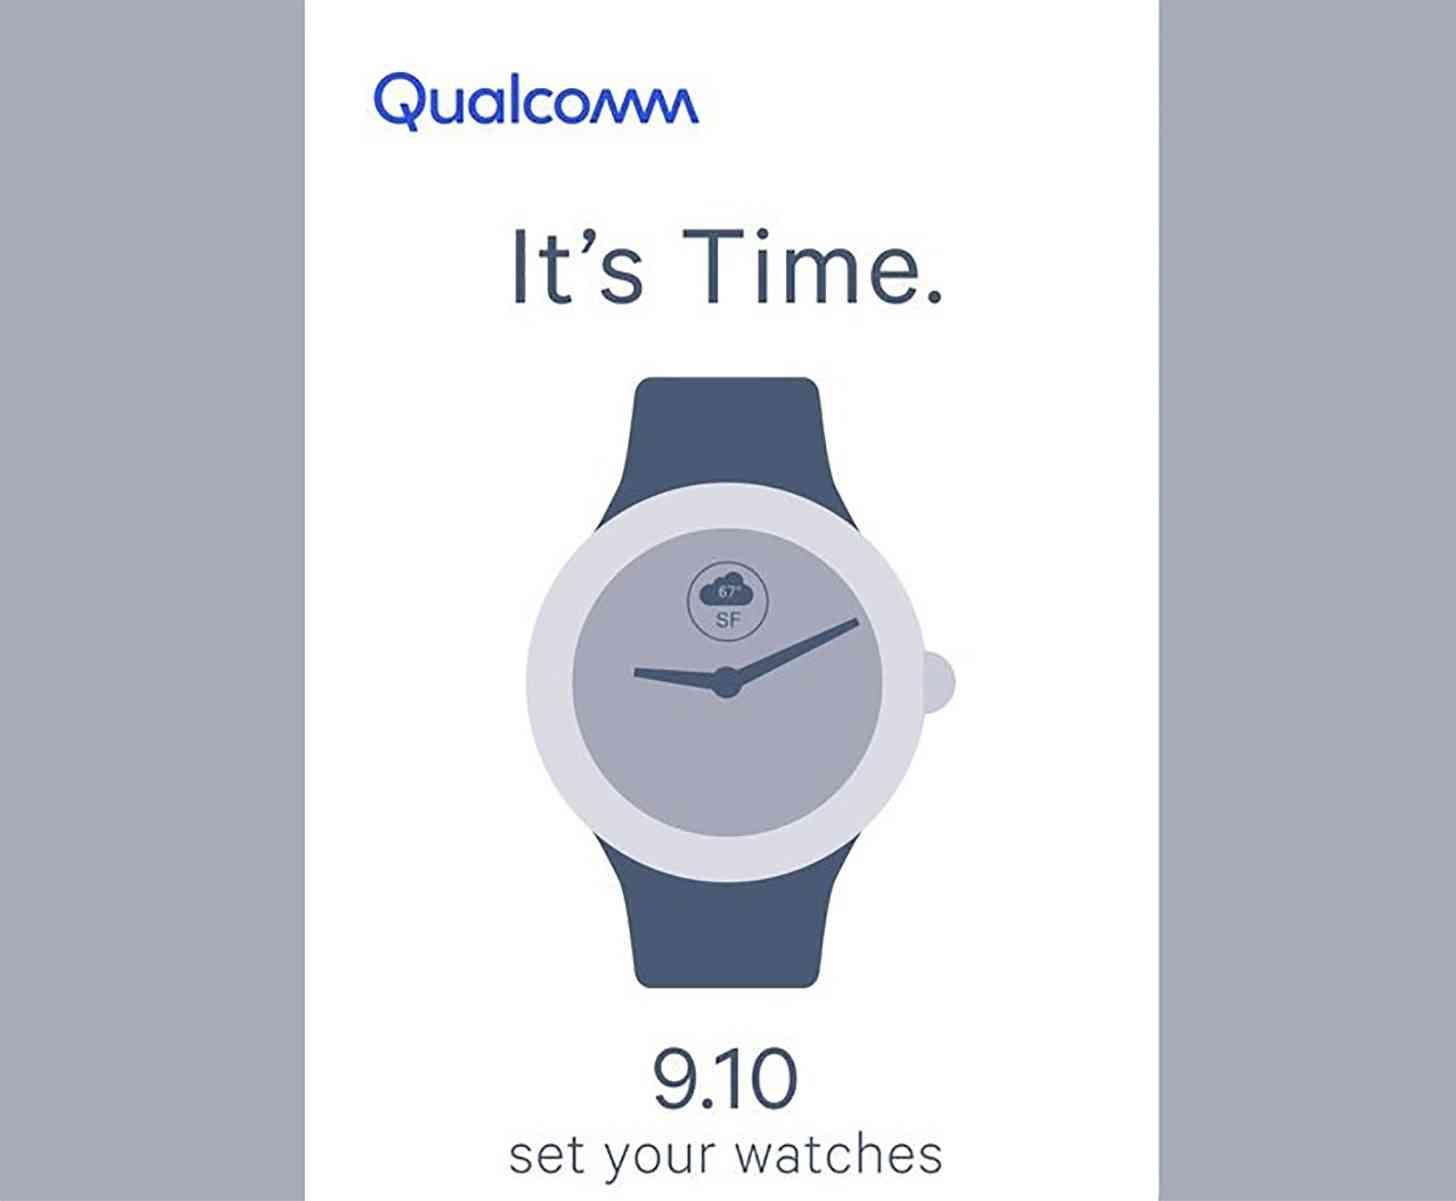 Qualcomm smartwatch event teaser